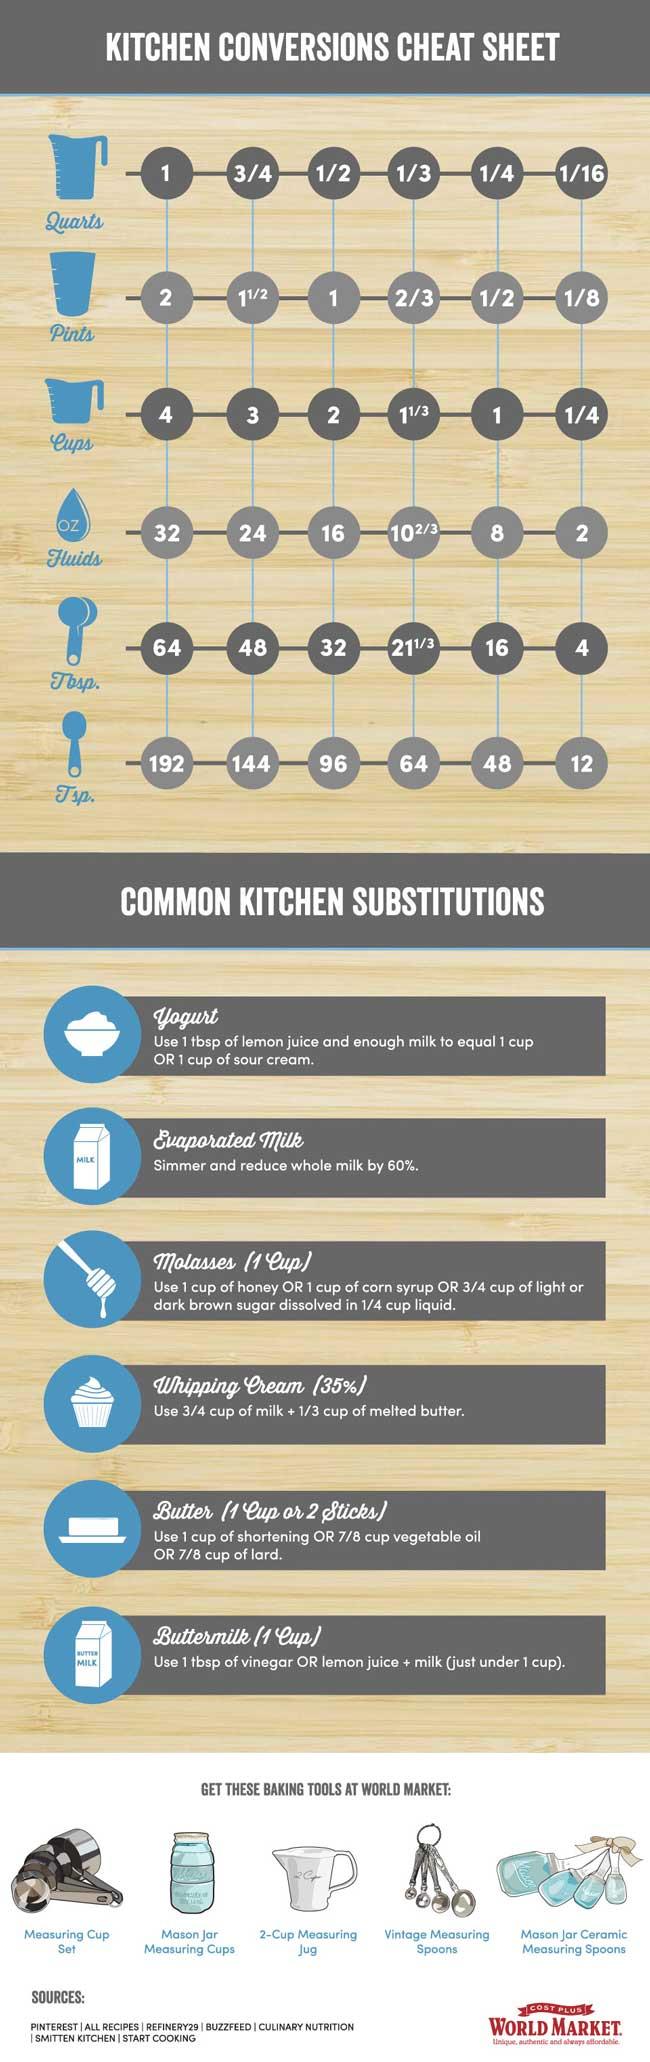 kitchen-conversion-cheat-sheet.jpg